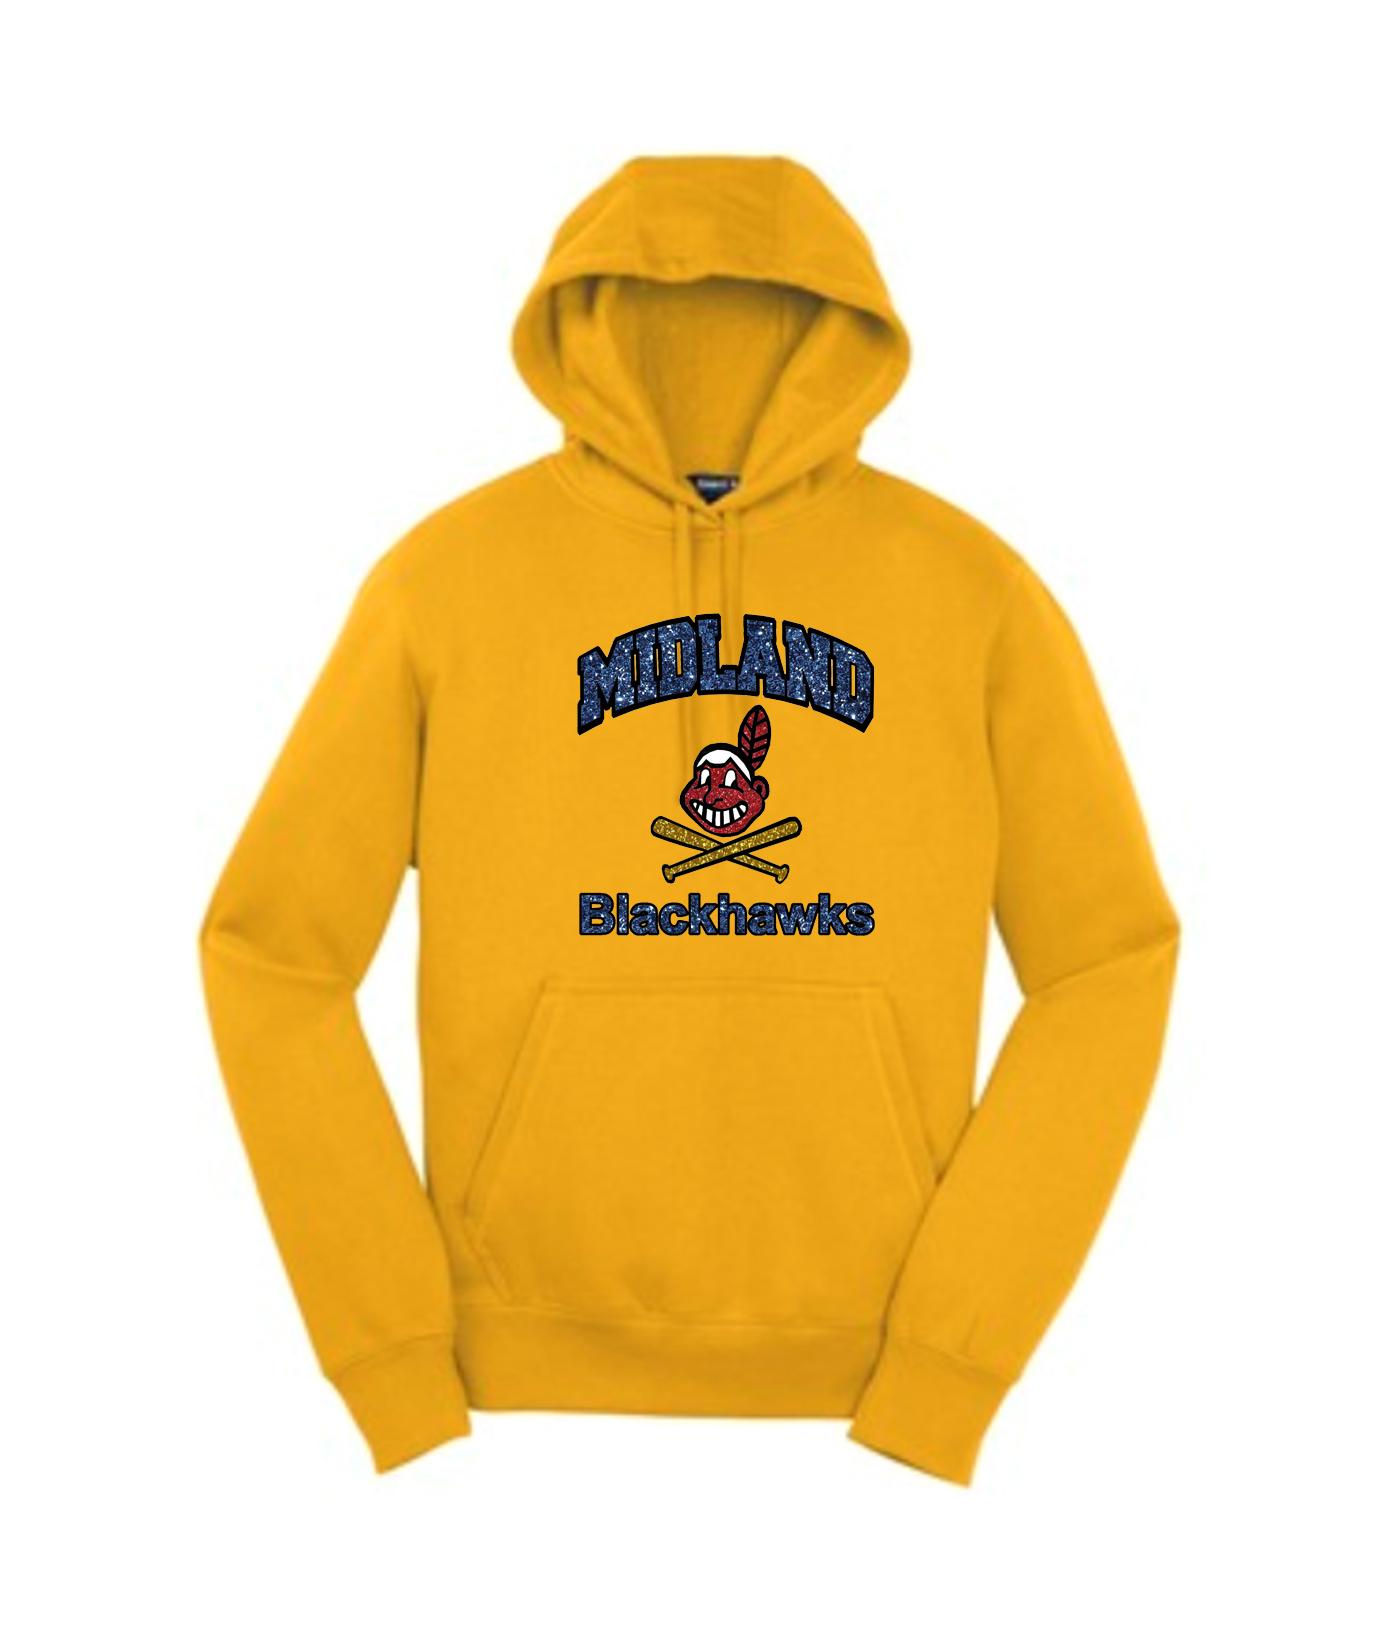 Sport-Tek Gold Pullover Hooded Sweatshirt Glitter Curved Blackhawk